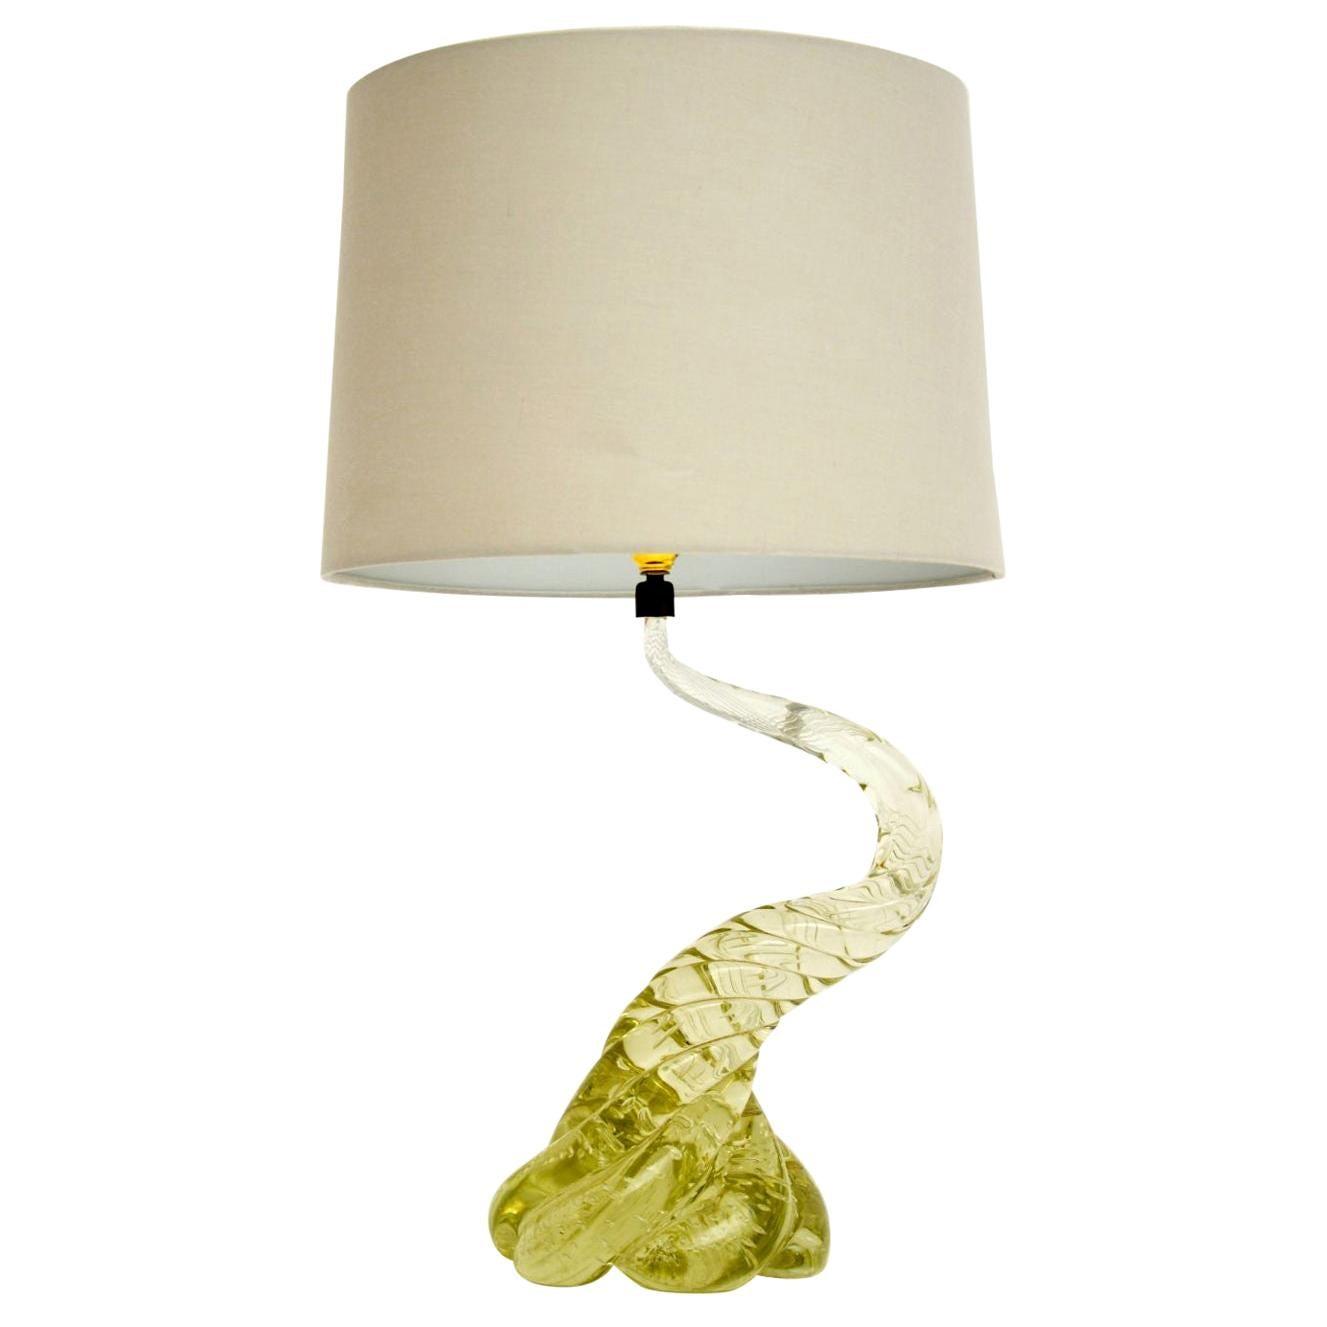 1960s Italian Murano Glass Table Lamp